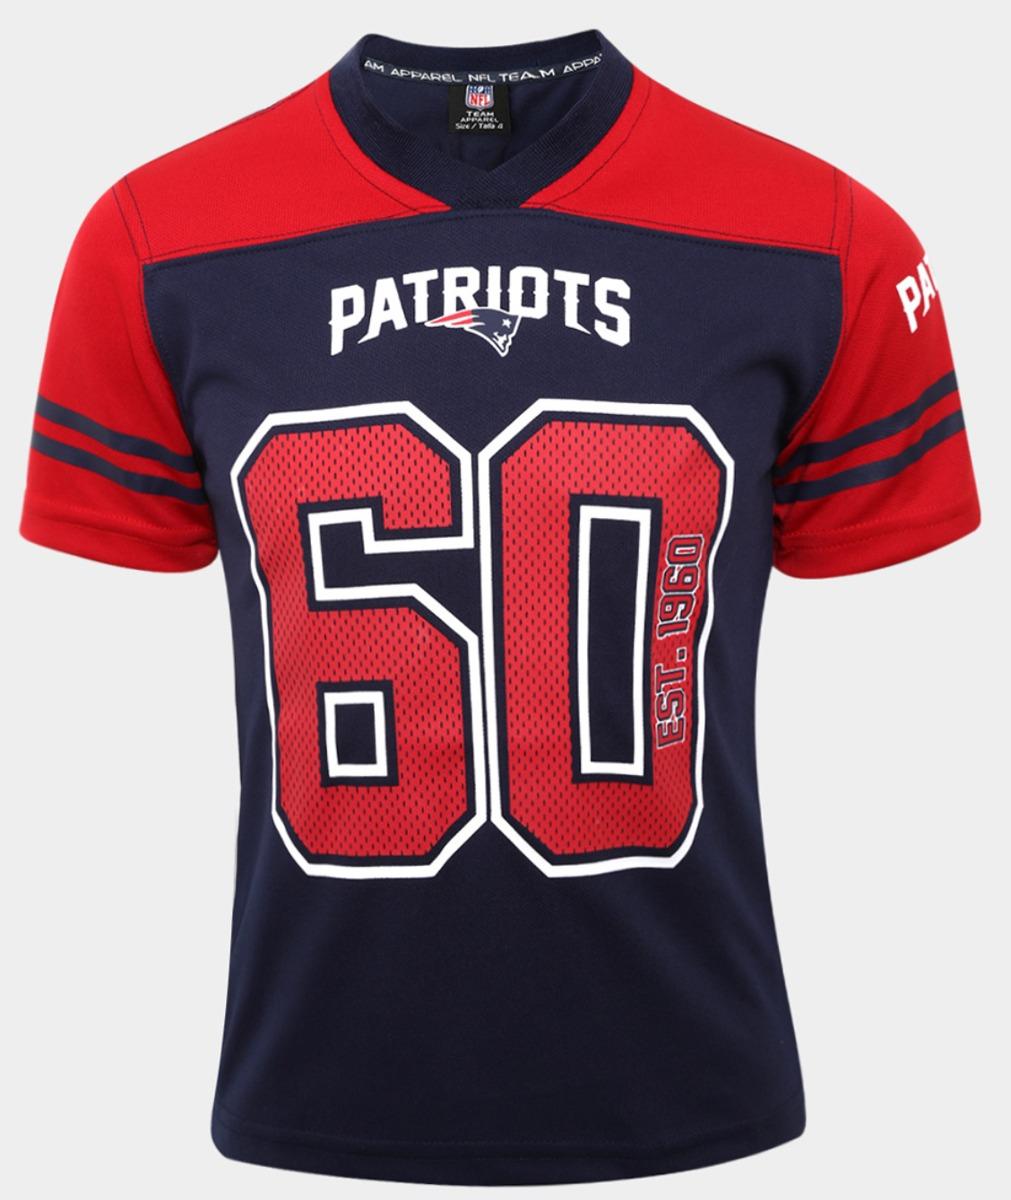 b0cd9a5dc7c88 Nfl Jersey New England Patriots Patriotas -   549.00 en Mercado Libre